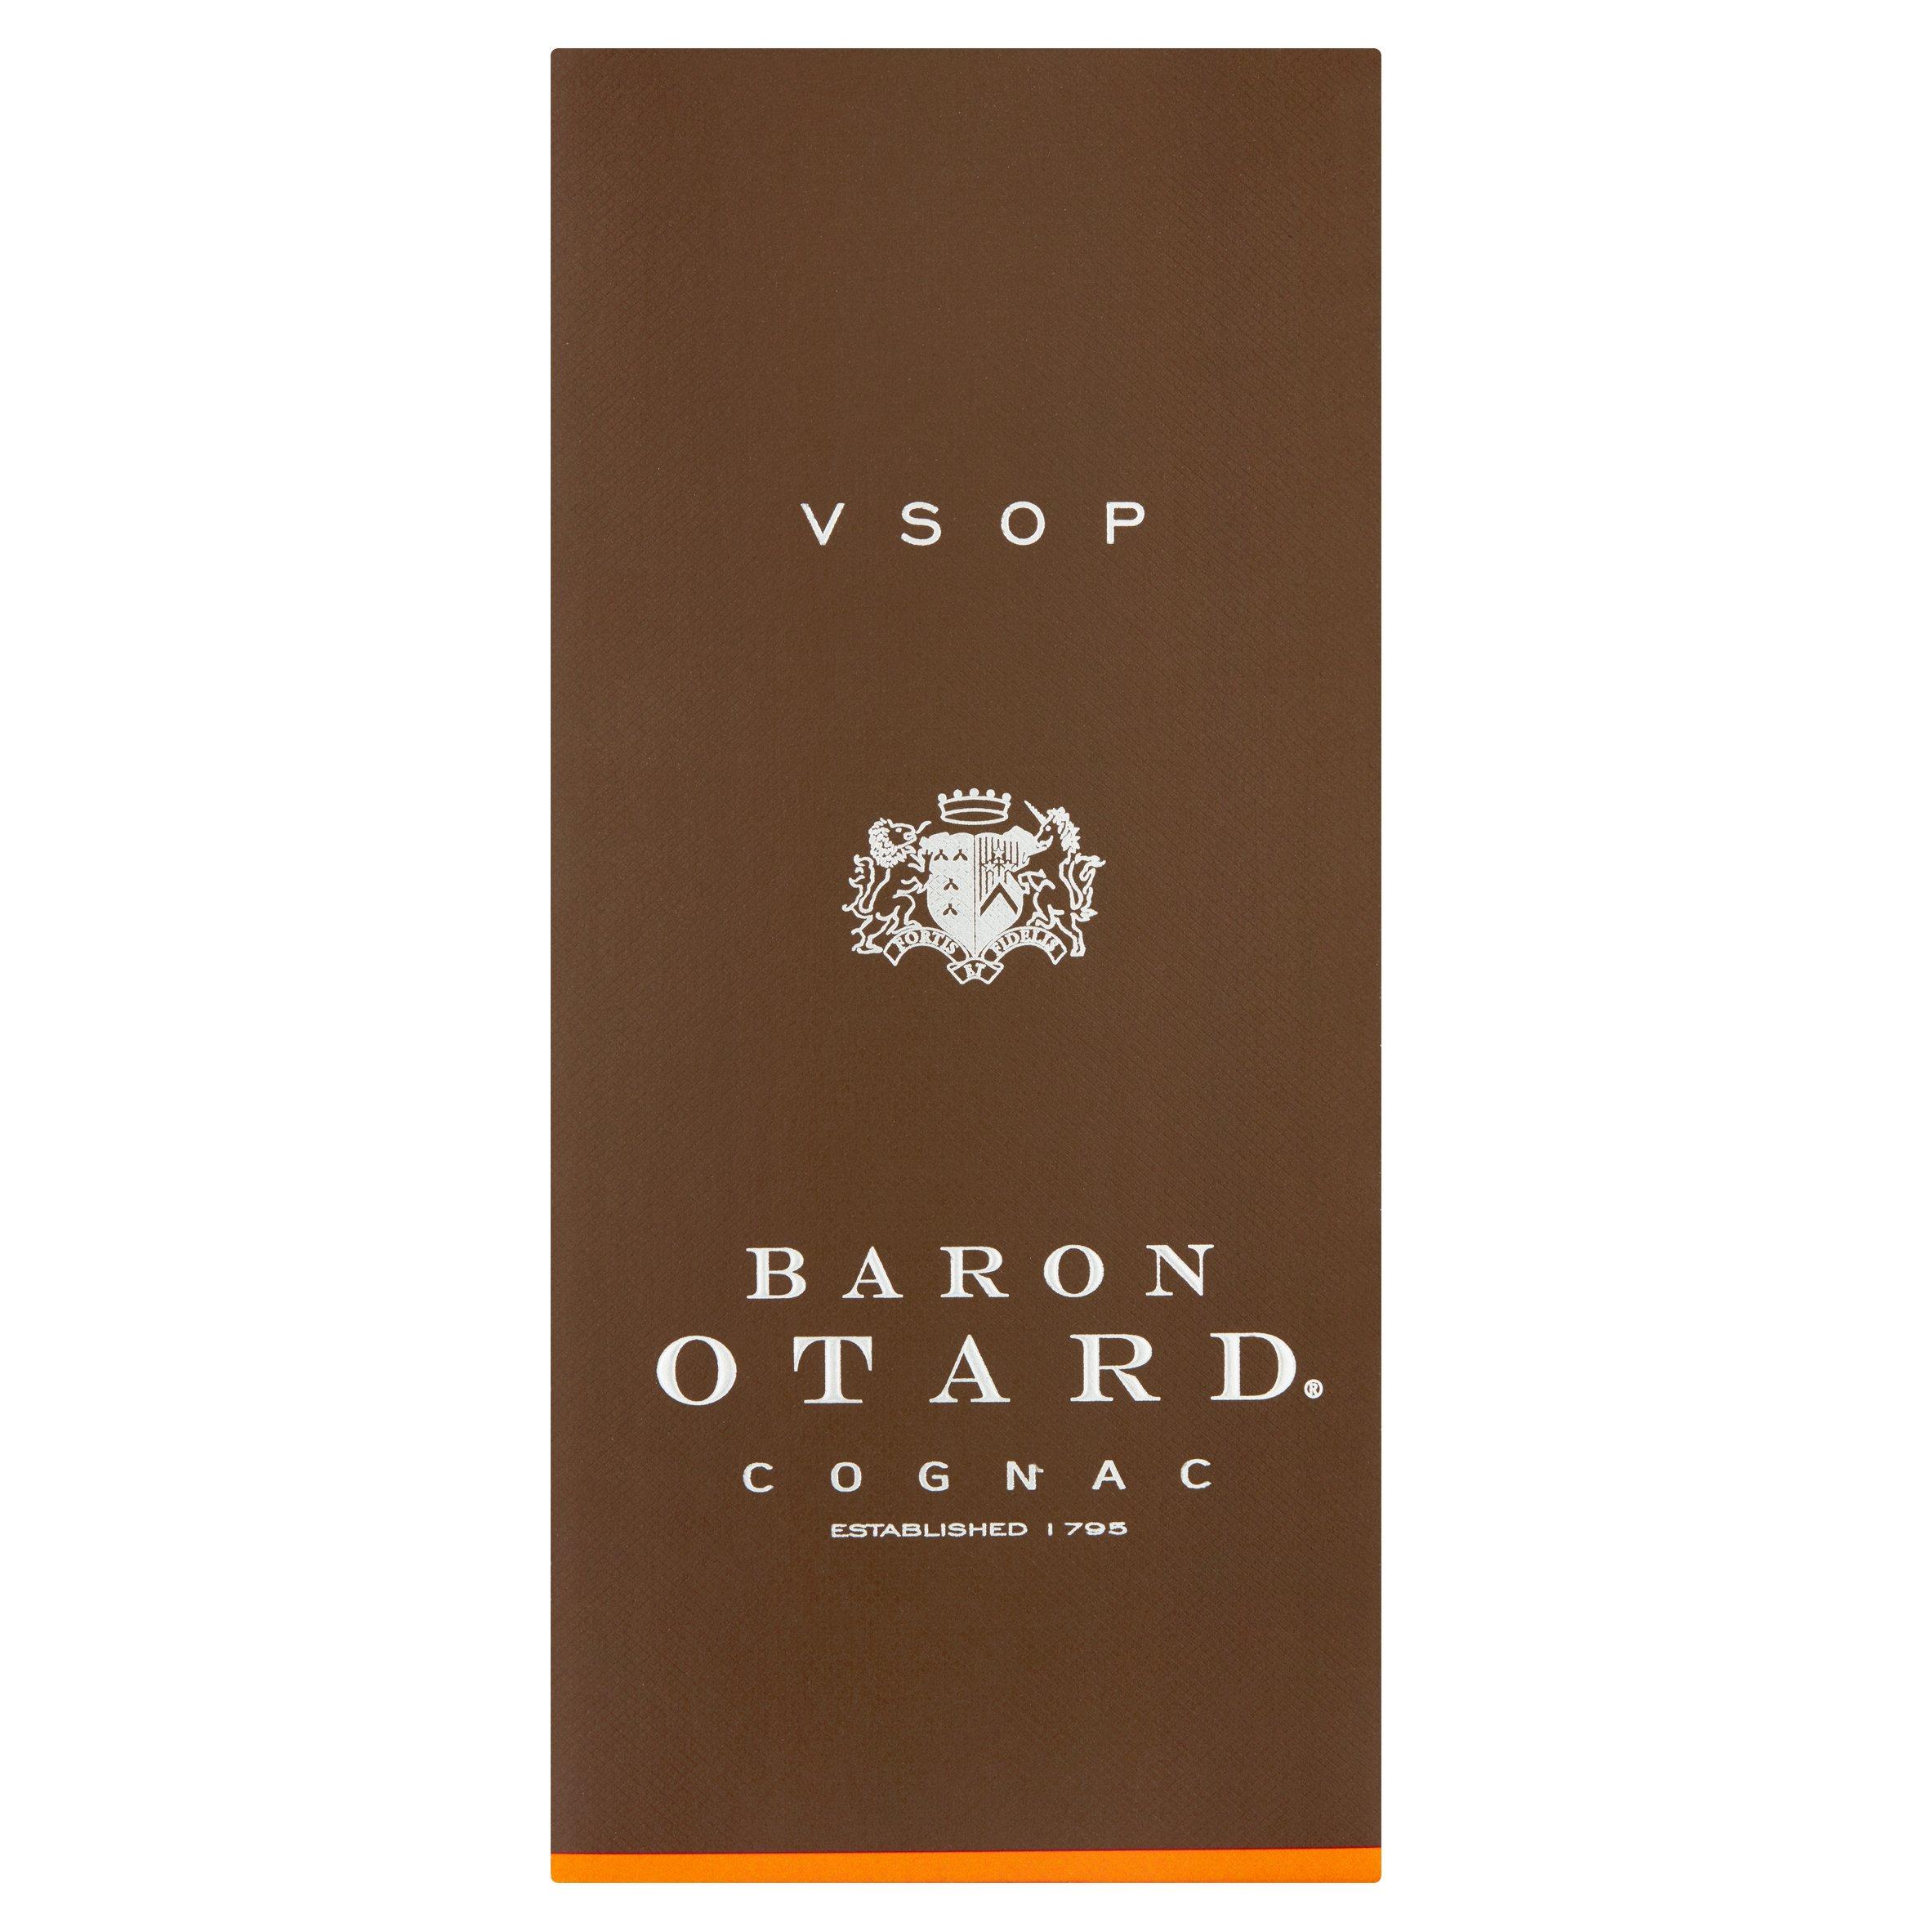 Baron Otard VSOP Koniak 700ml (2)